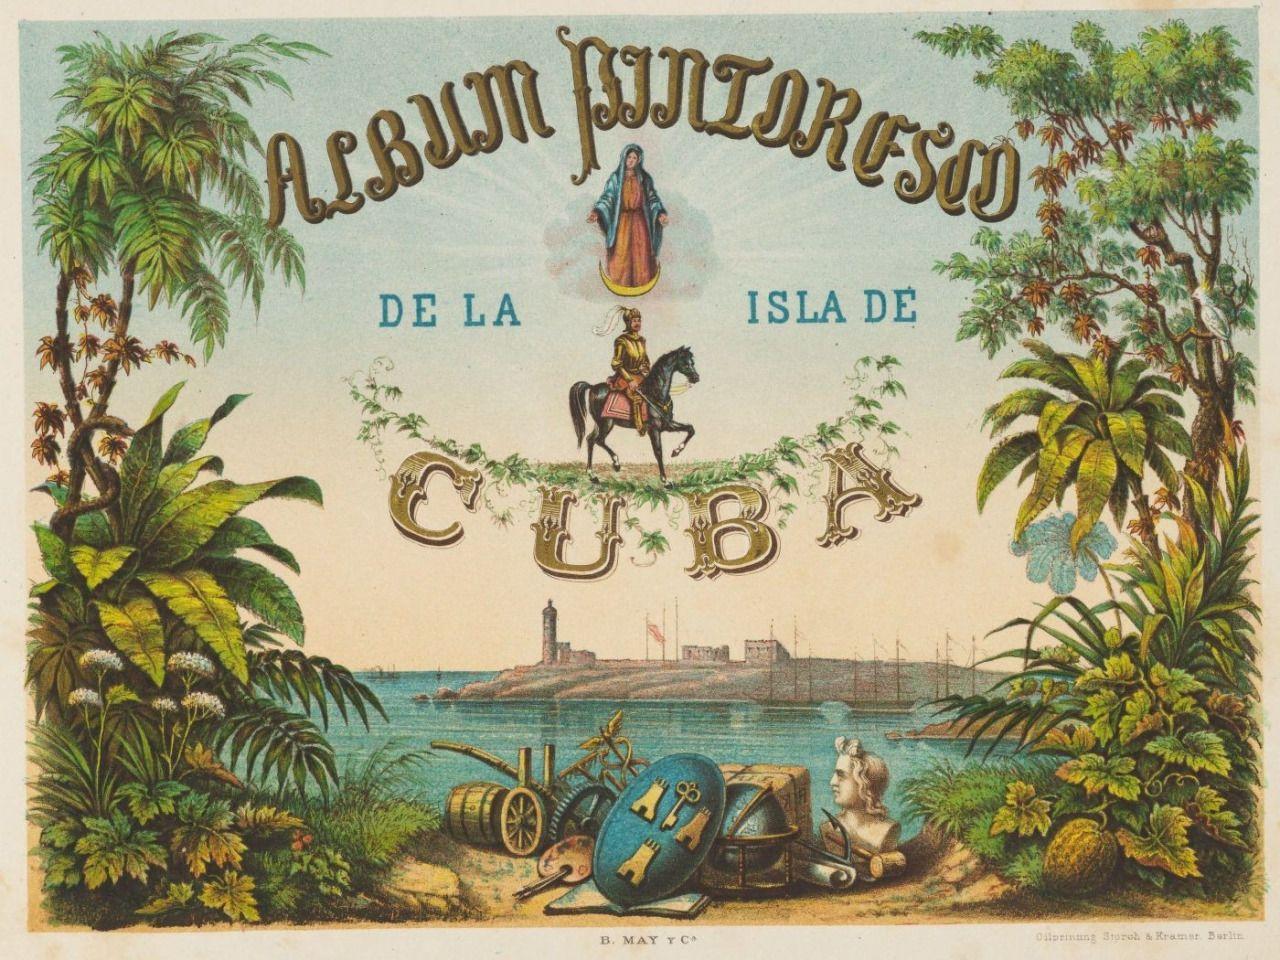 Album pintoresco de la isla de Cuba, 1859. ... — Houghton Library ...